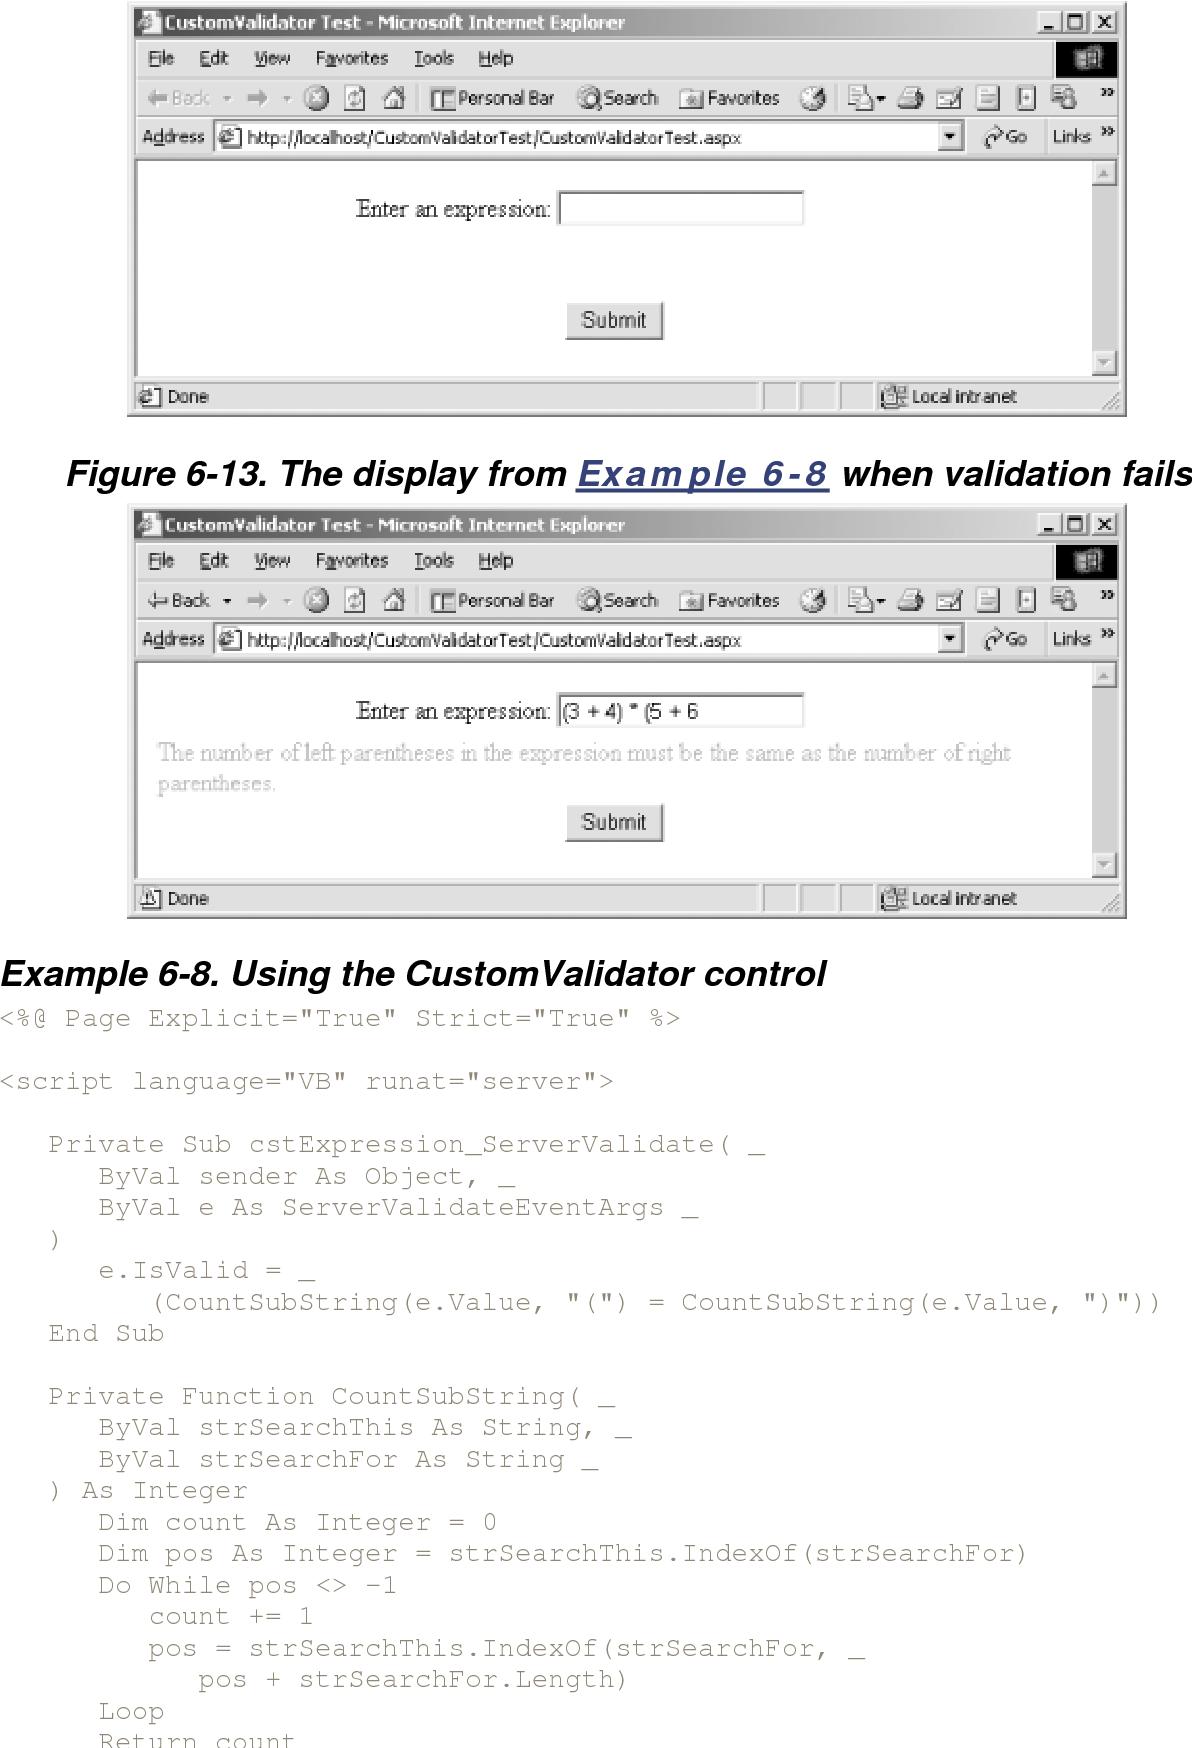 Figure 6-13 from Programming in Visual Basic Net - Semantic